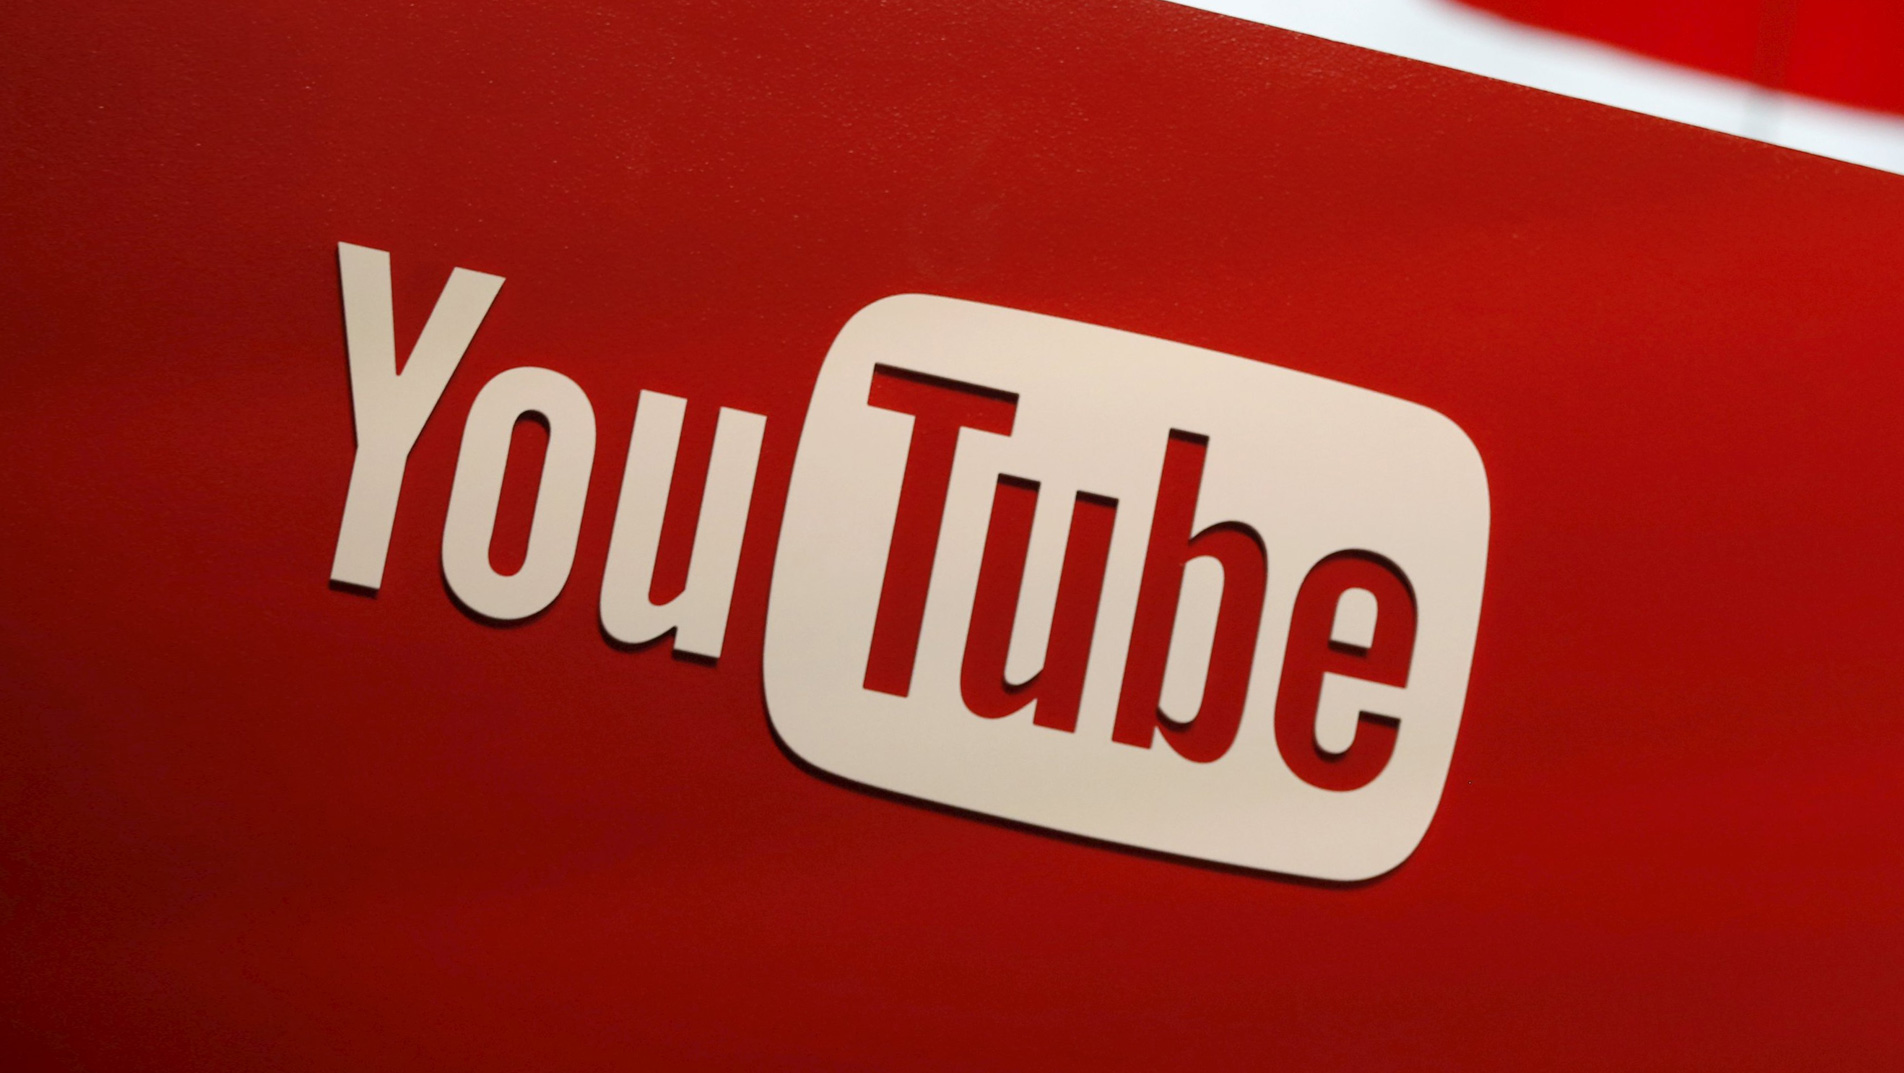 youtube ne veut pas vous laisser t u00e9l u00e9charger ses vid u00e9os avec tubeninja - tech